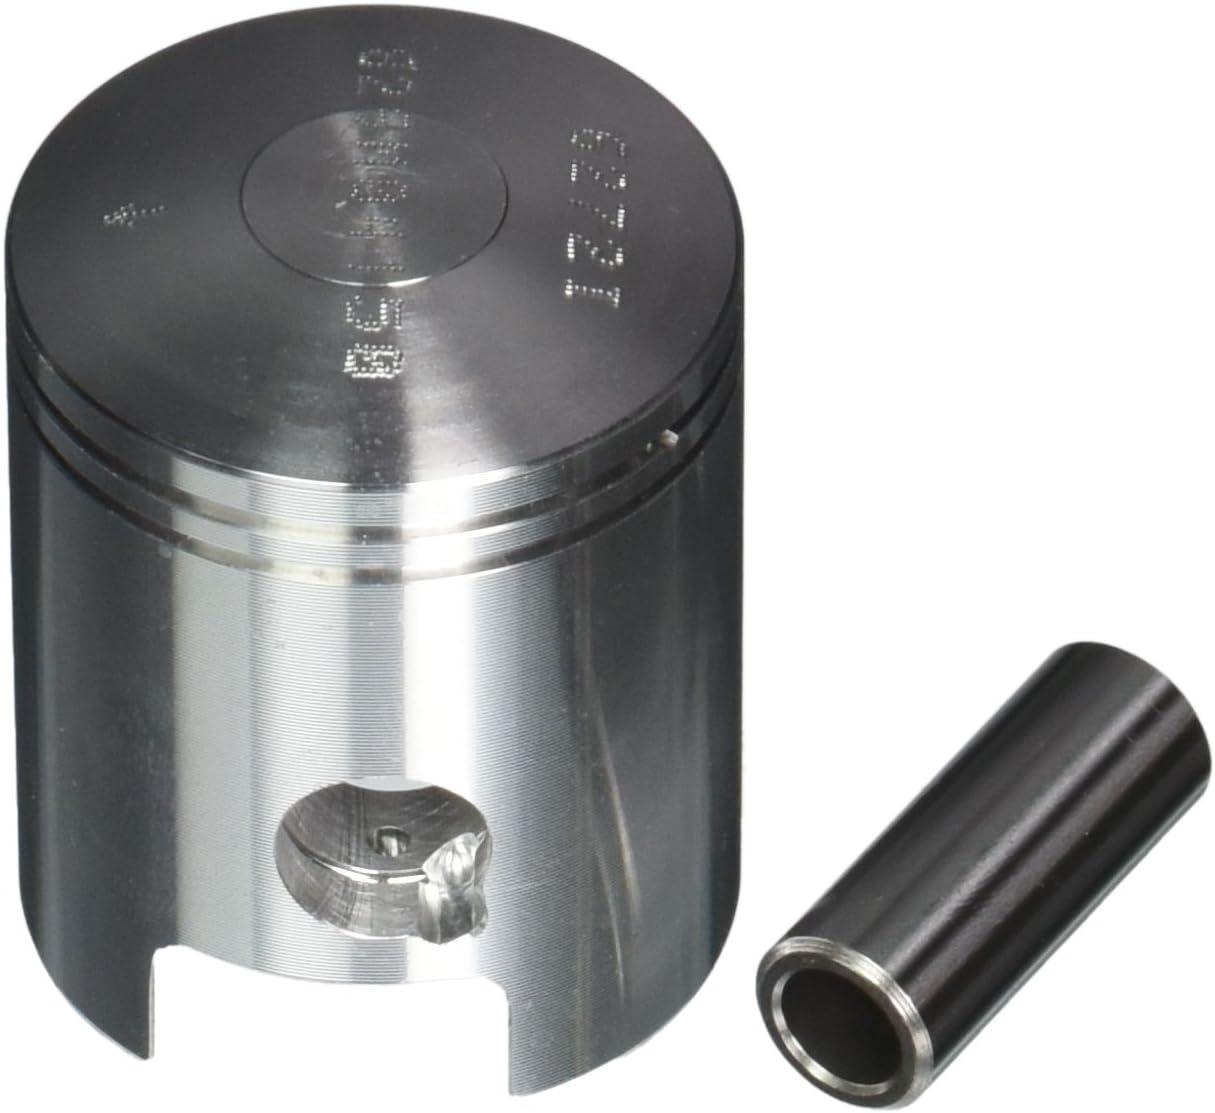 Wiseco 826M04100 41.00 mm 2-Stroke Off-Road Piston